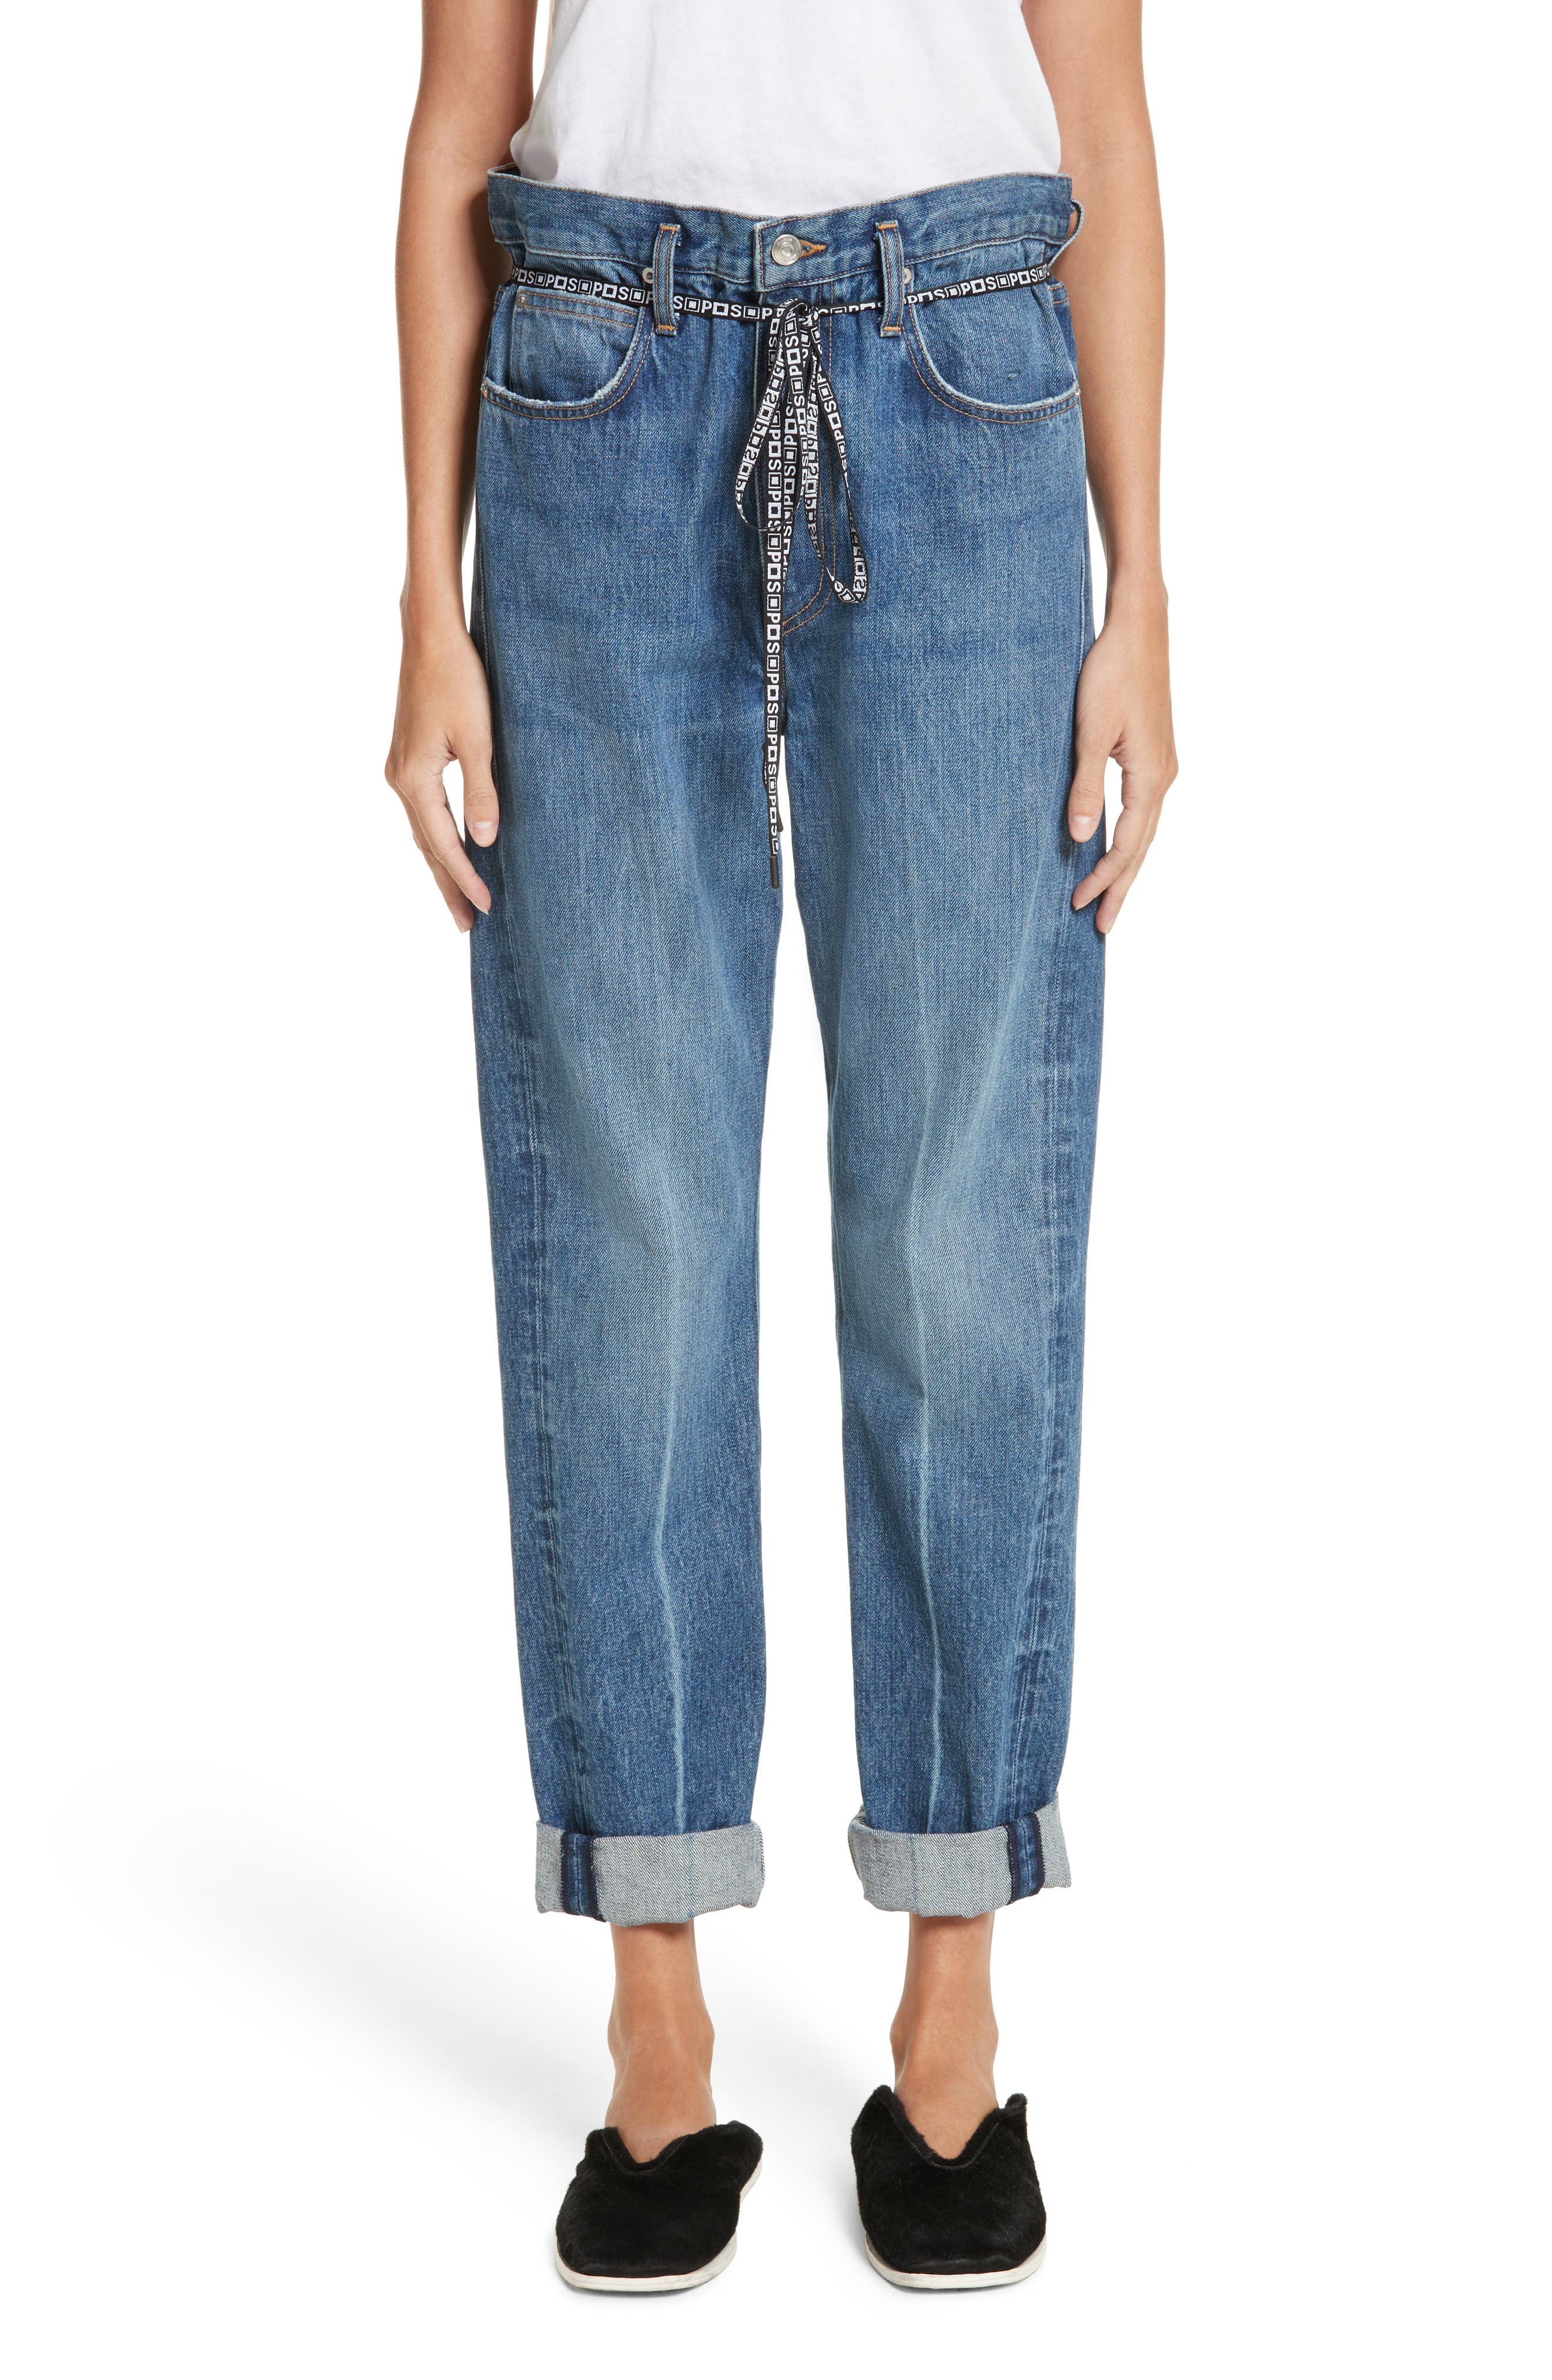 PSWL Cuffed Straight Leg Jeans,                             Alternate thumbnail 2, color,                             MEDIUM BLUE